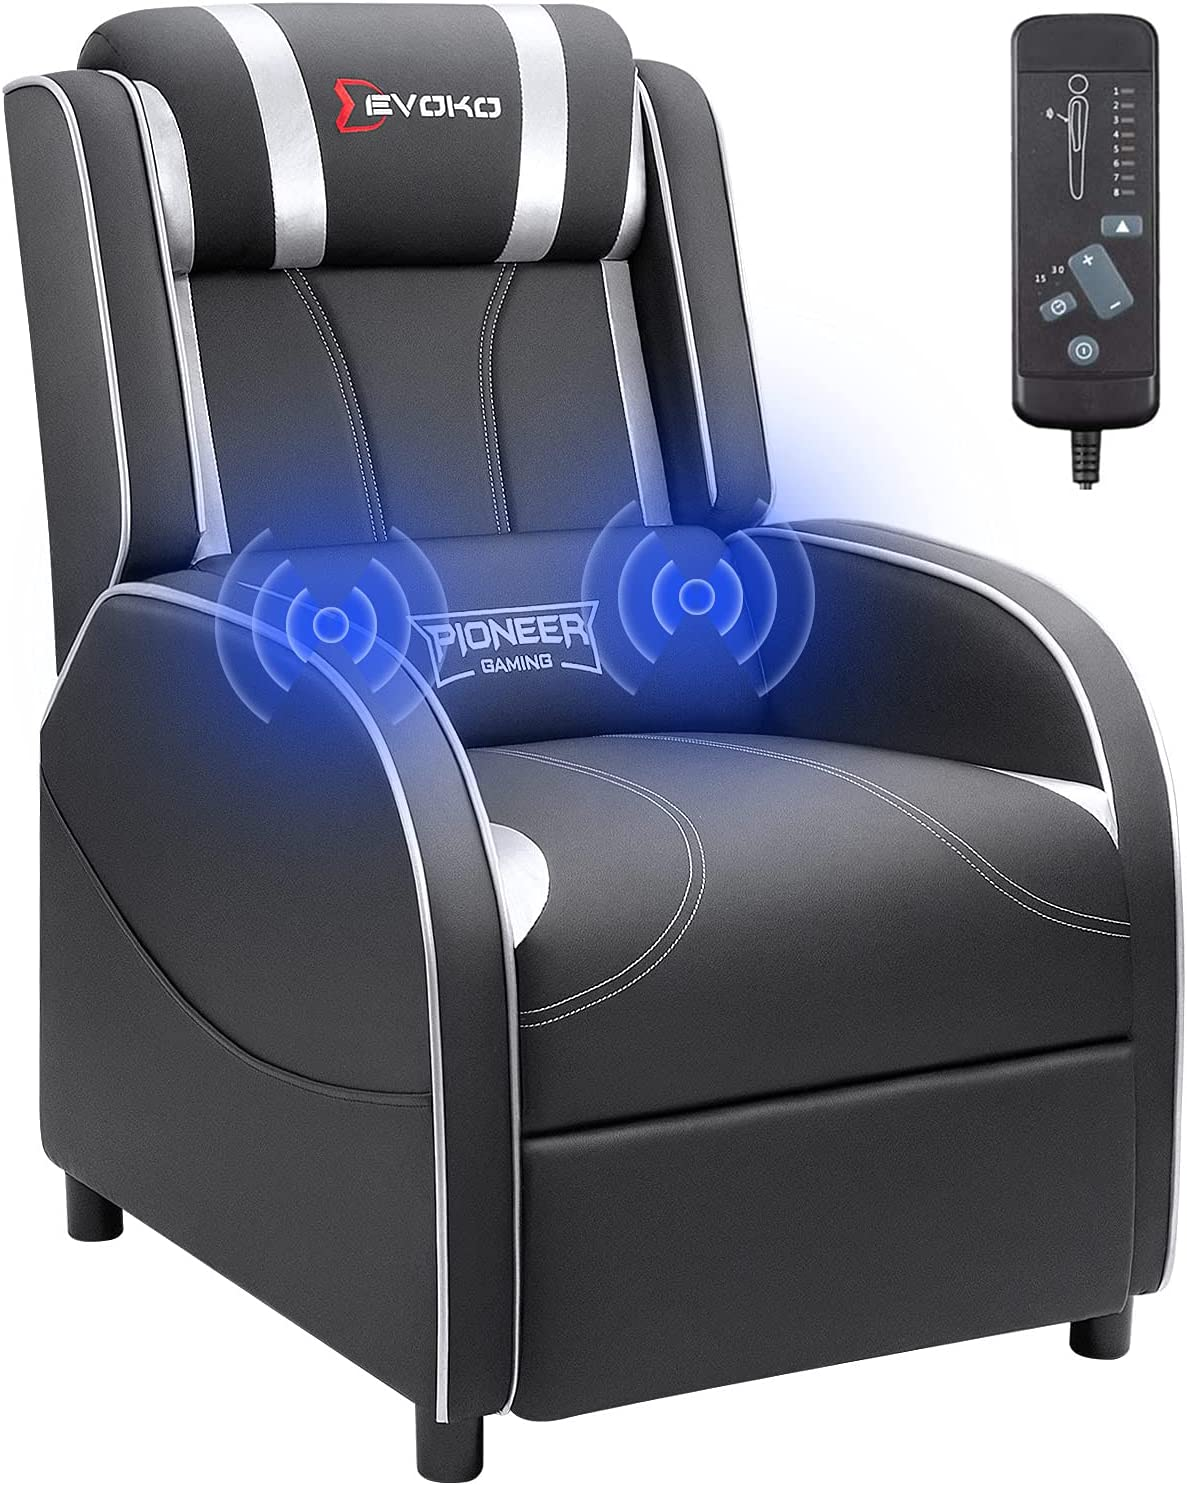 Devoko Massage Gaming Recliner Chair Sea PU Theater SALENEW very Arlington Mall popular Leather Home